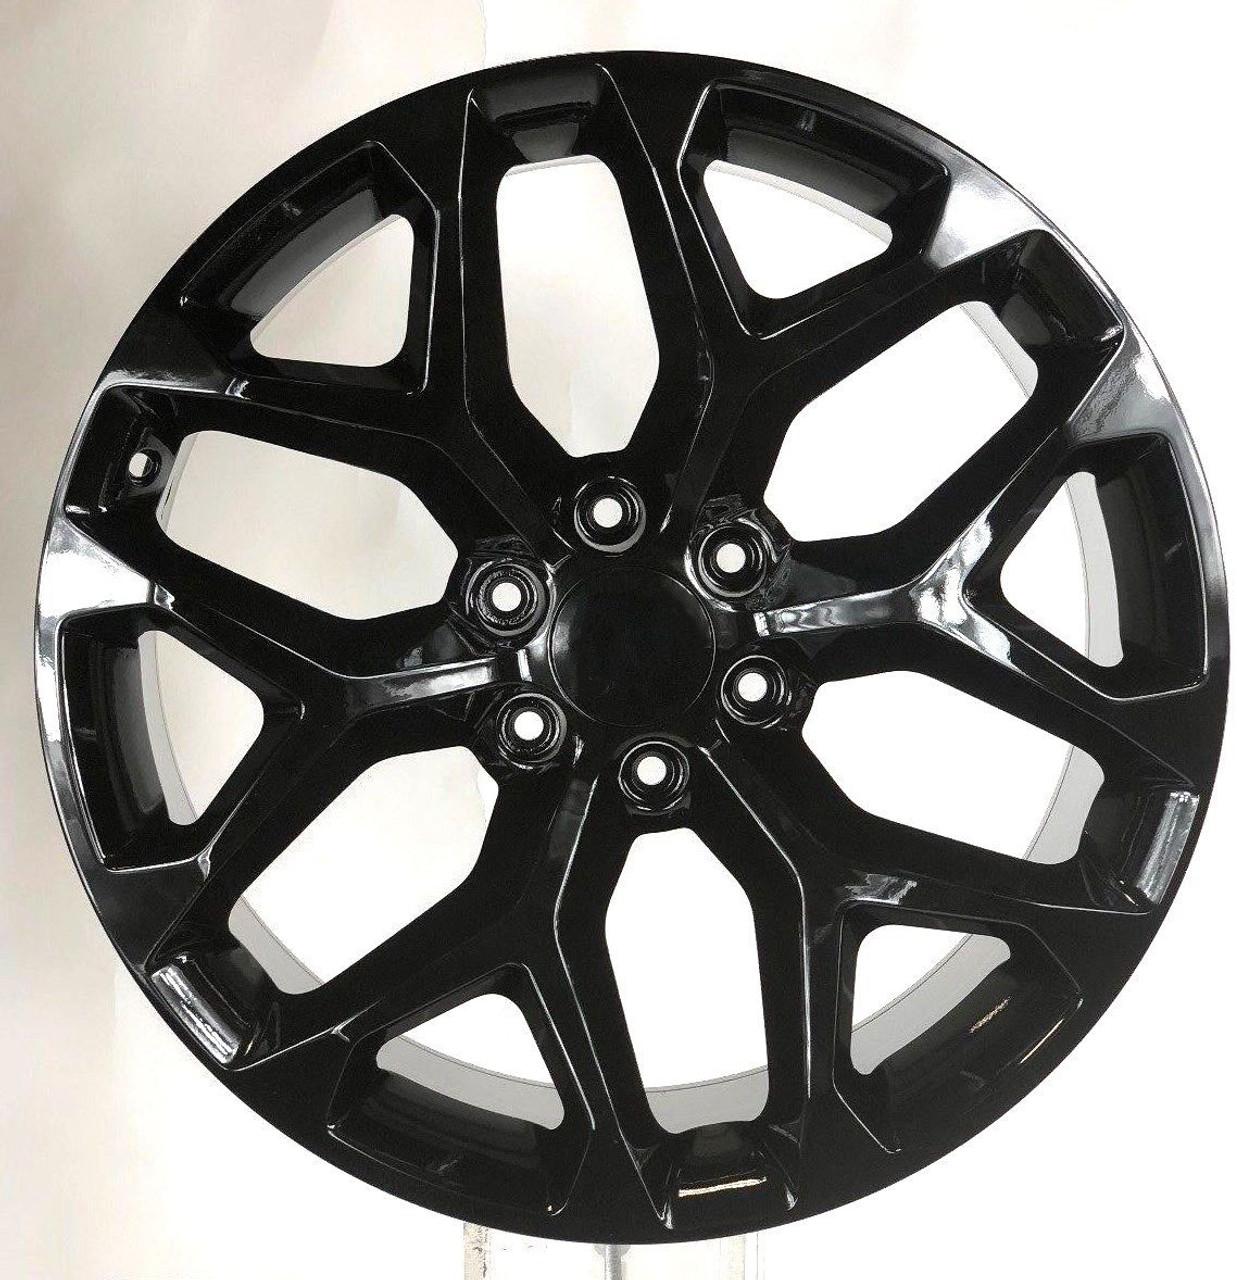 Gmc 20 Gloss Black Snowflake Wheels For Sierra Yukon Denali